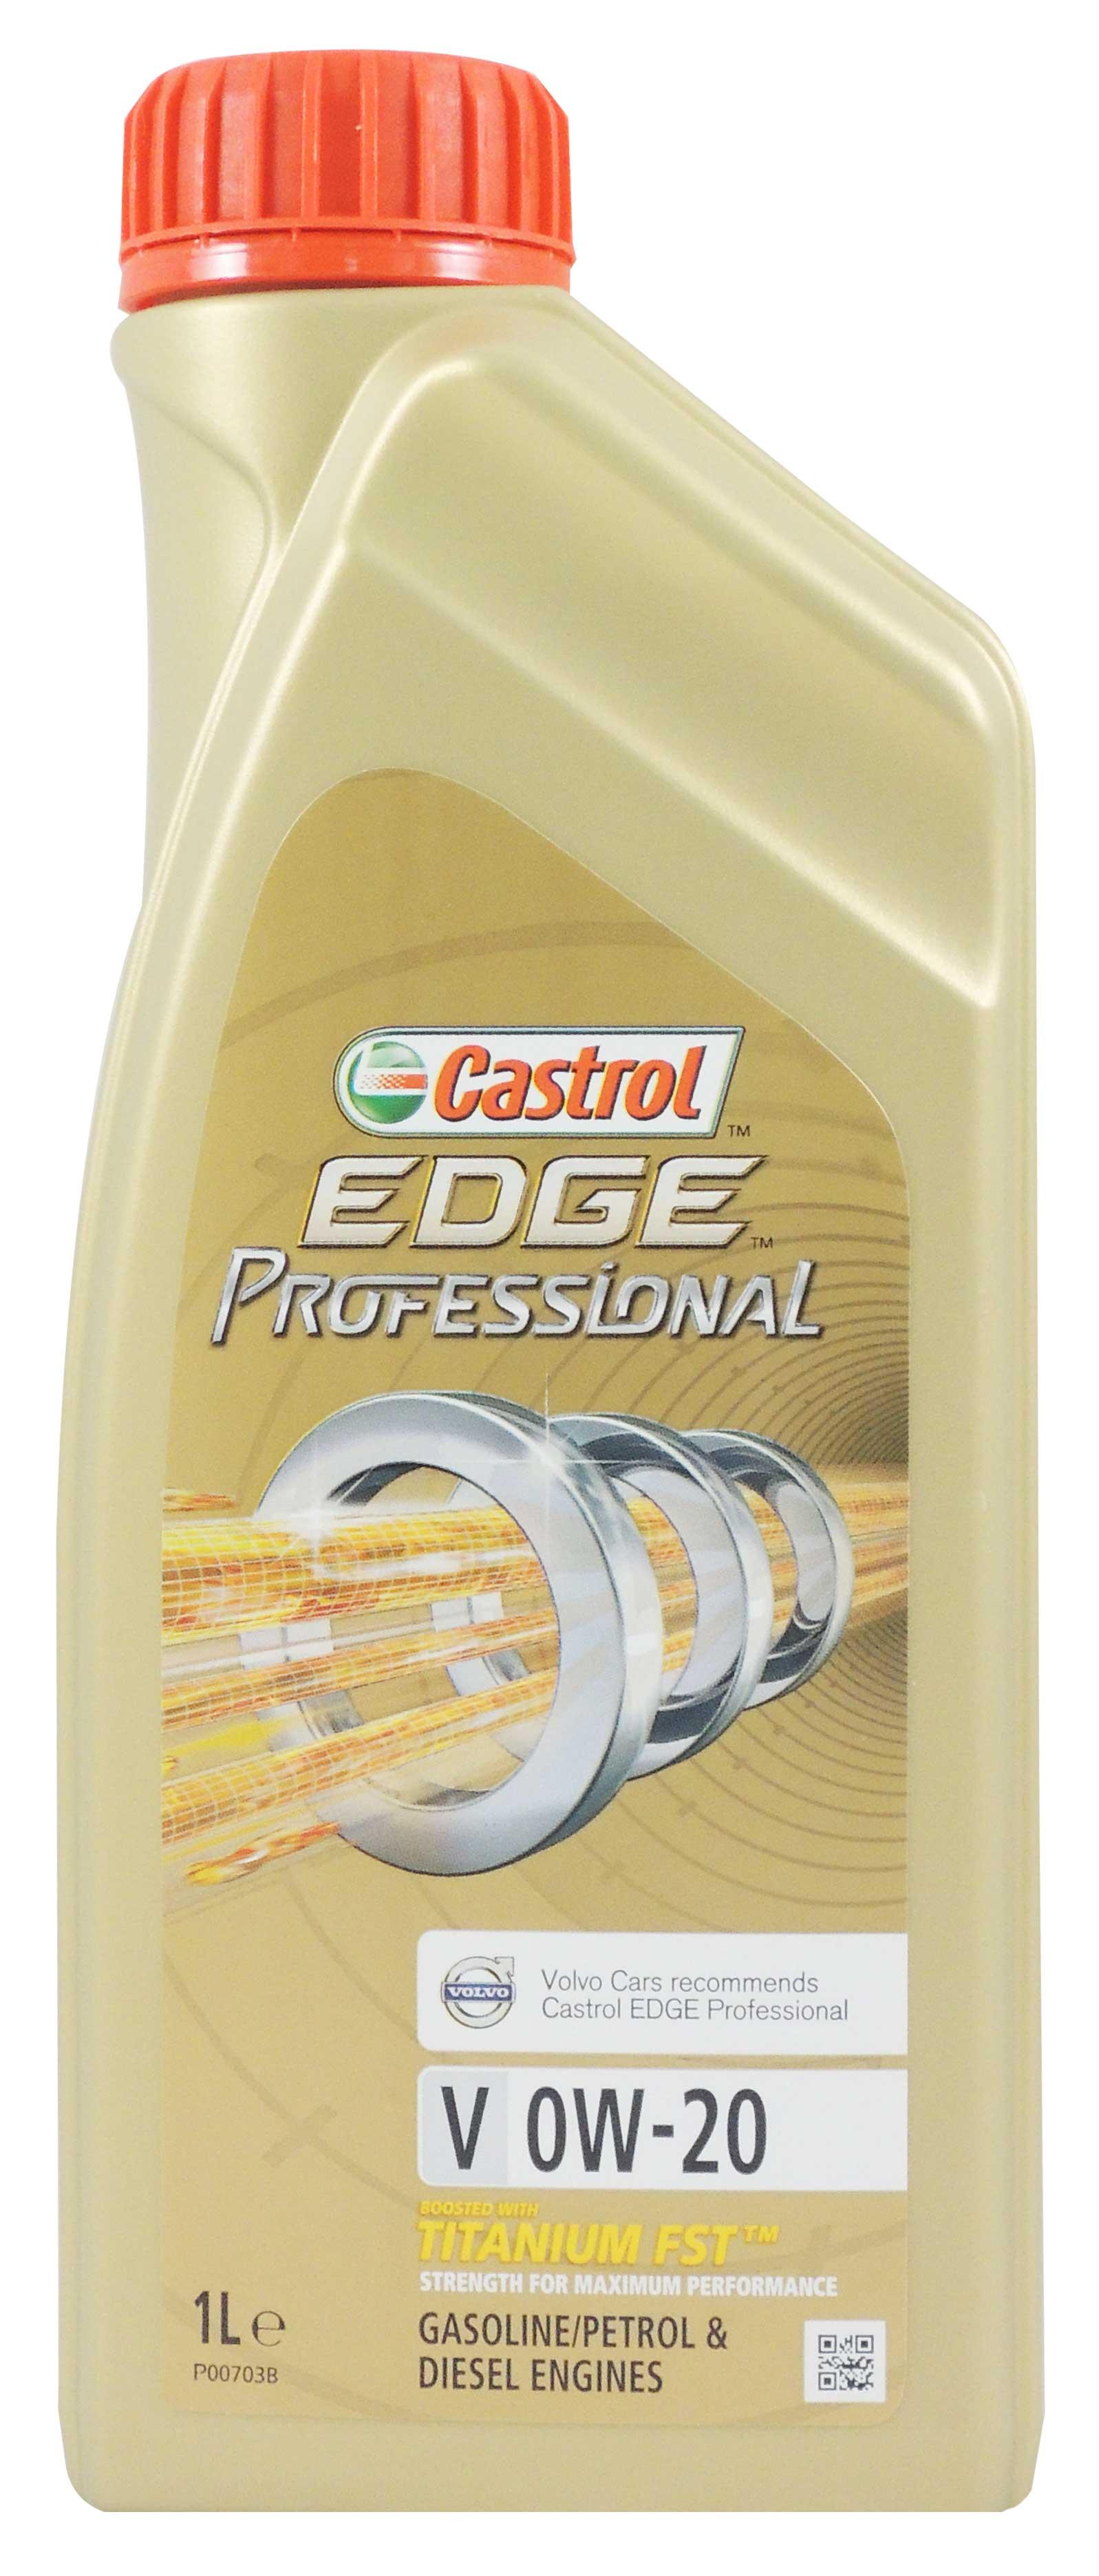 【CASTROL】 EDGE Professional V 全合成機油 0W-20 VOLVO